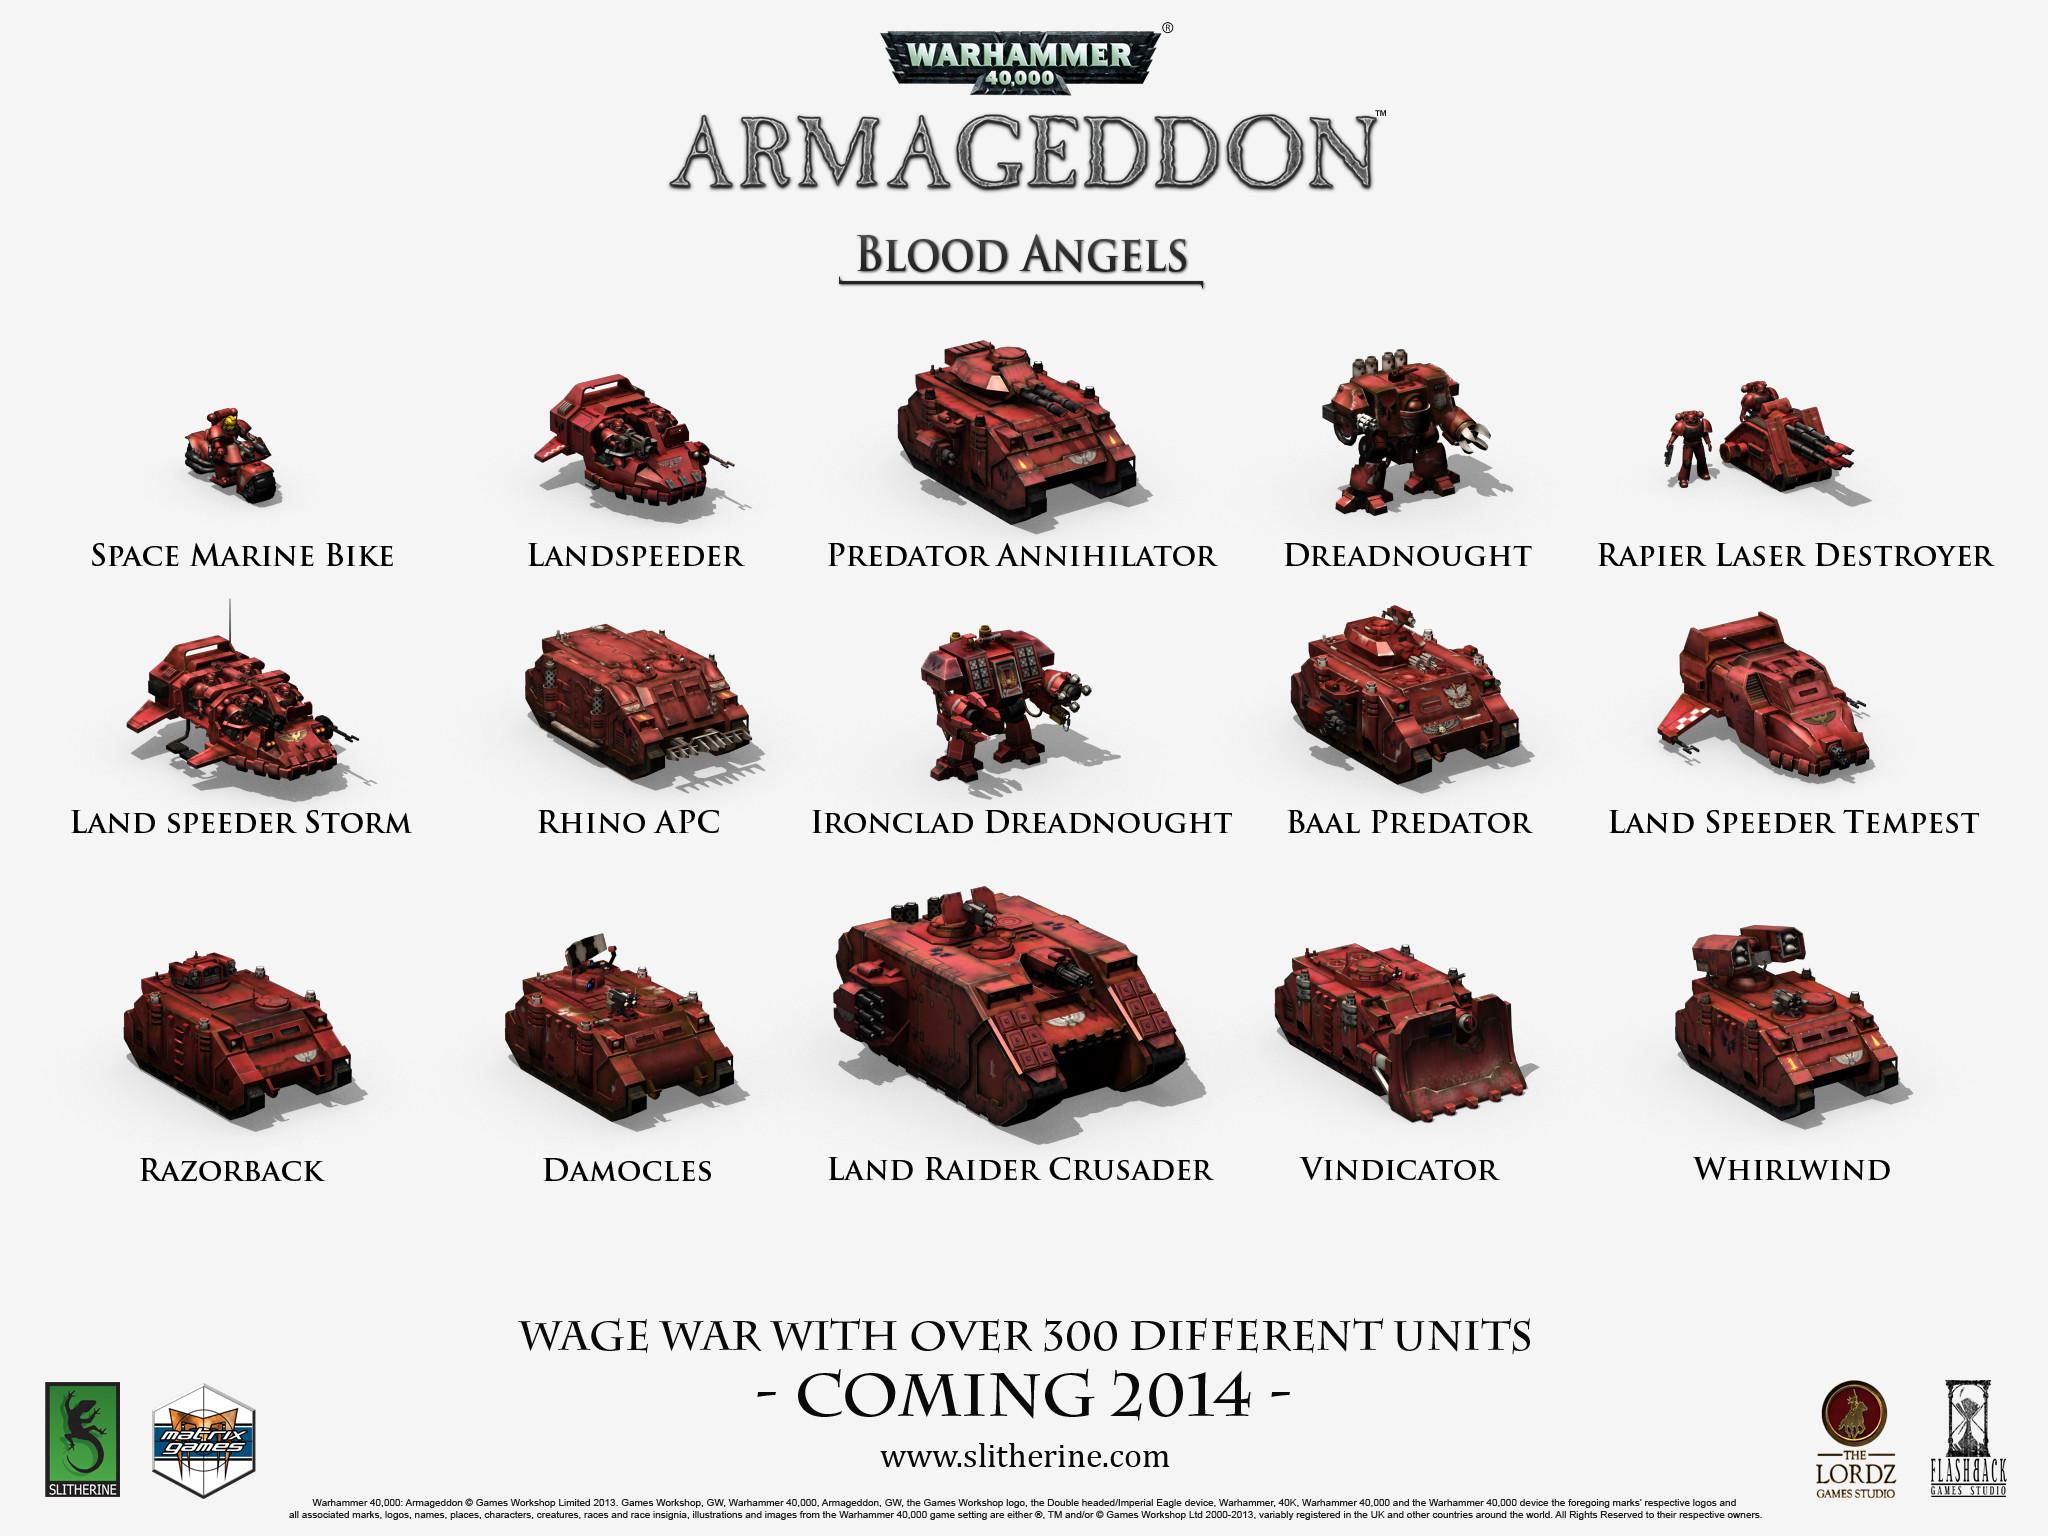 Warhammer 40,000 Armageddon Wallpapers!